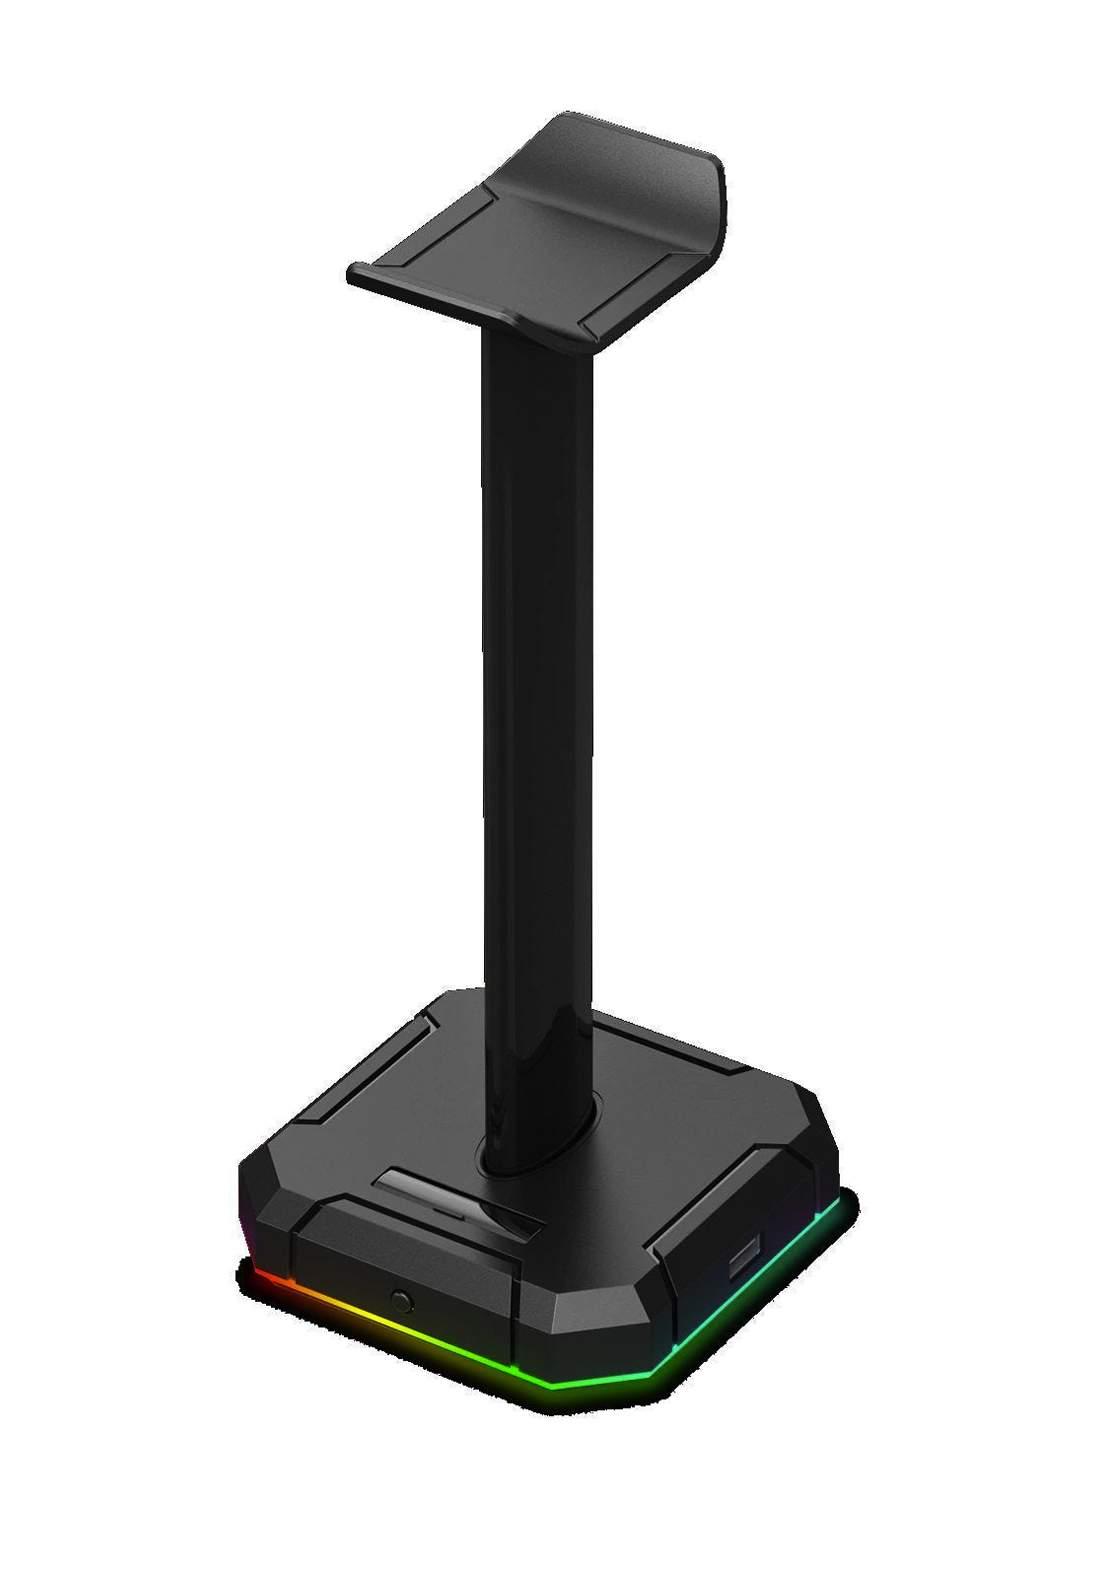 Redragon HA300 Scepter Pro Headset Stand RGB Backlit Gaming Headphone Stand ستاند لسماعات الرأس